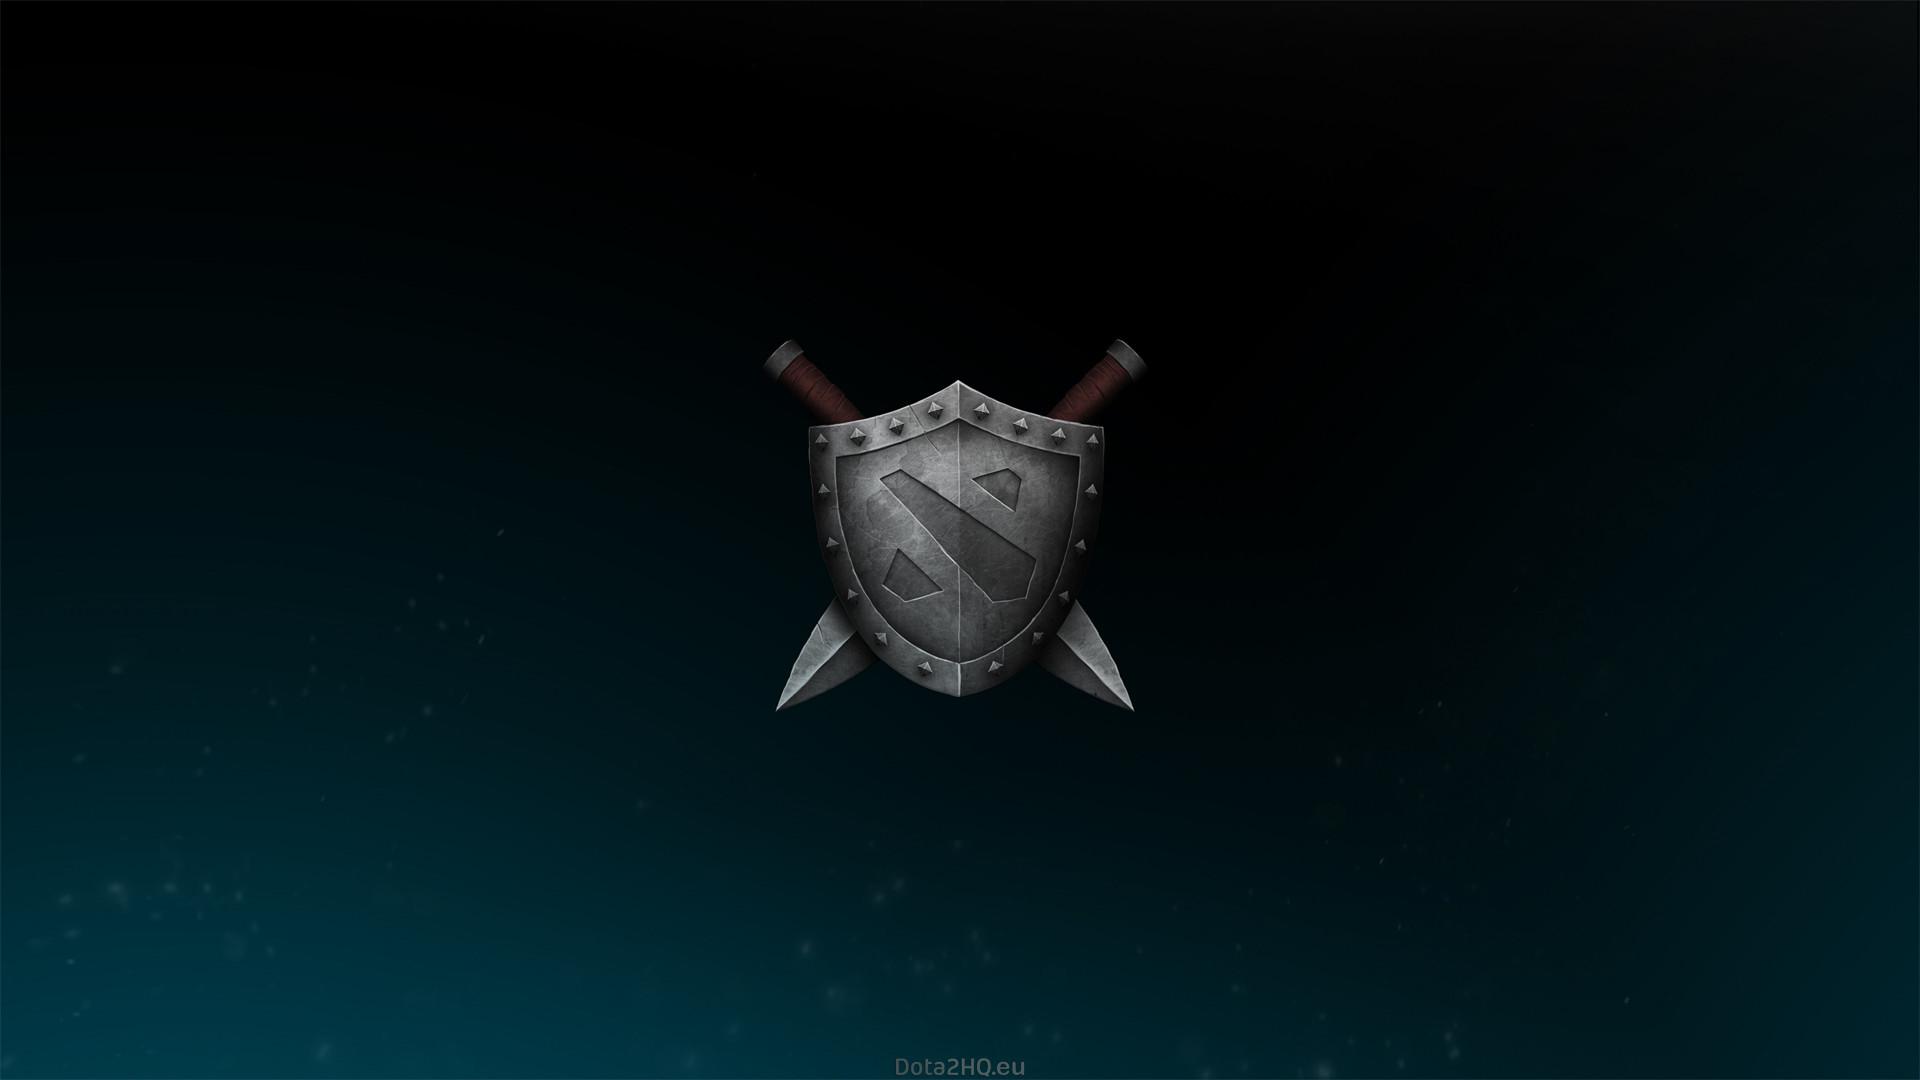 1920x1080 Wallpaper dota 2, shield, logo, sword 1920x1080